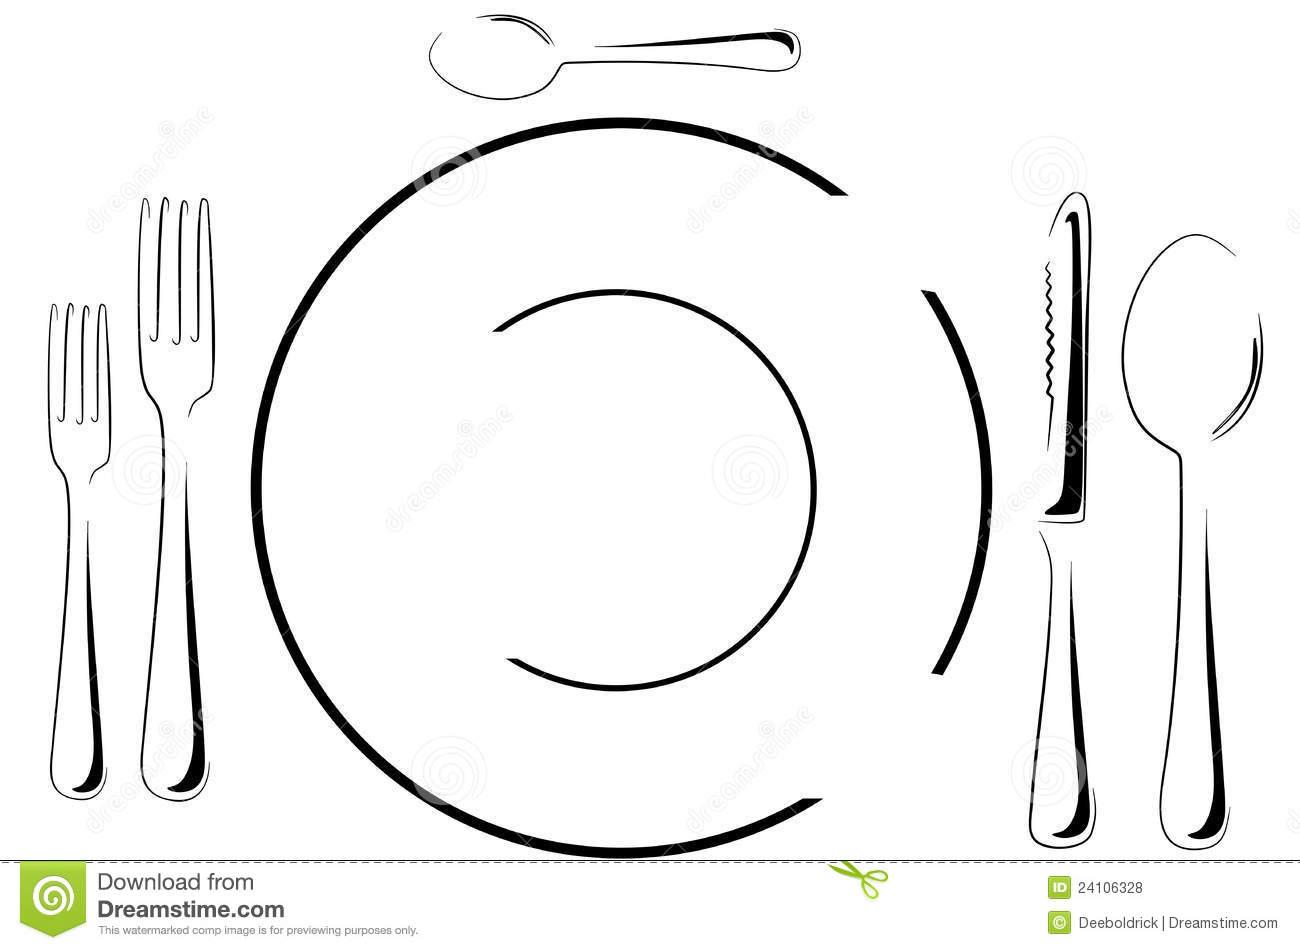 Table setting in line art stock vector. Illustration of formal.